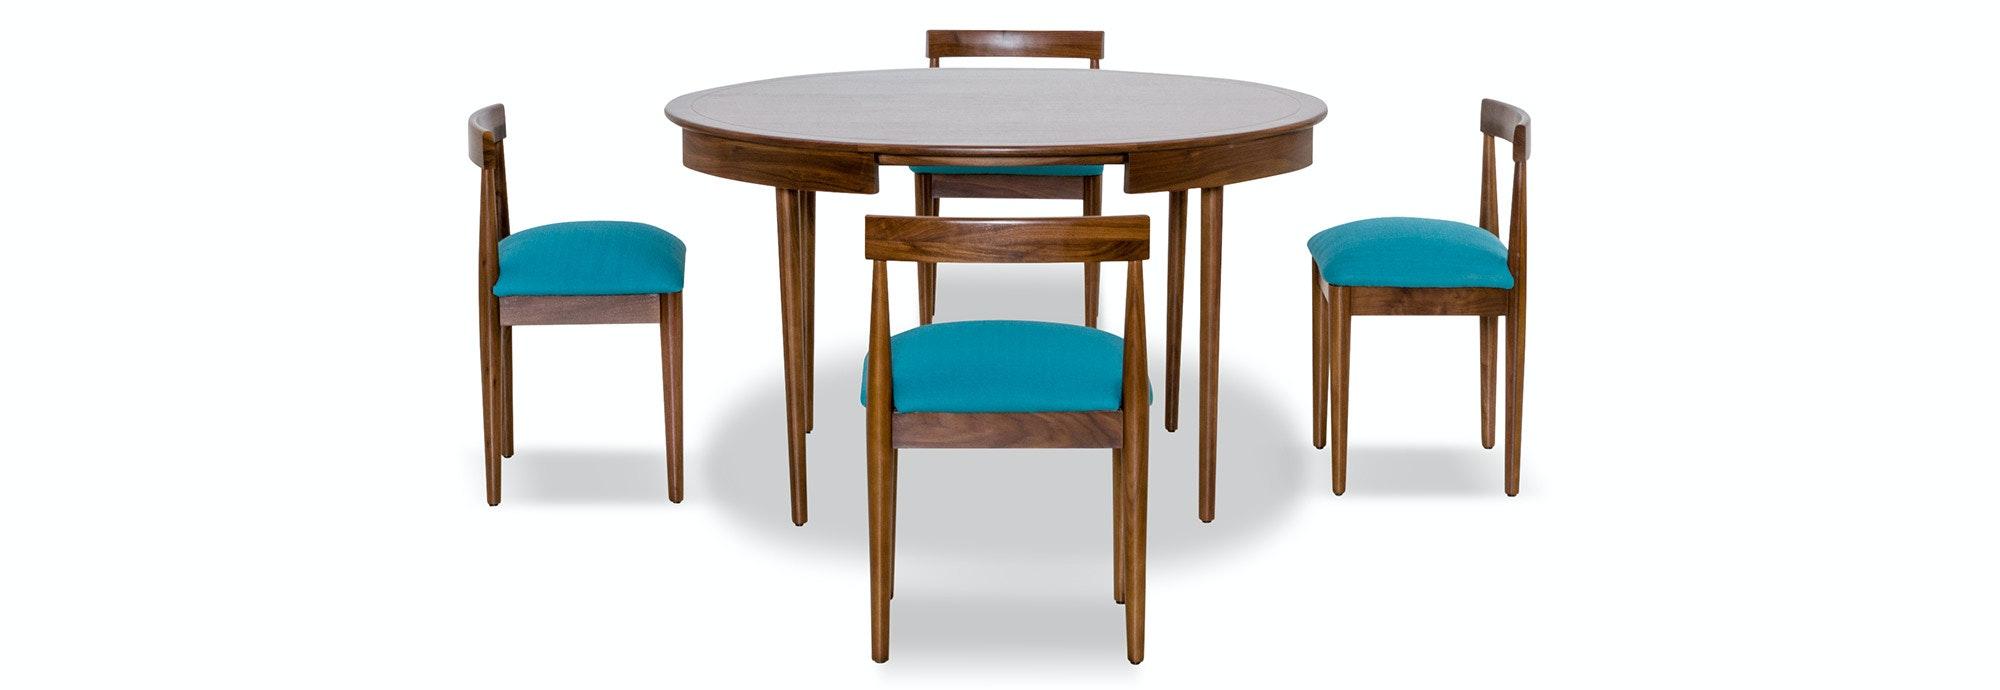 Toscano Dining Set